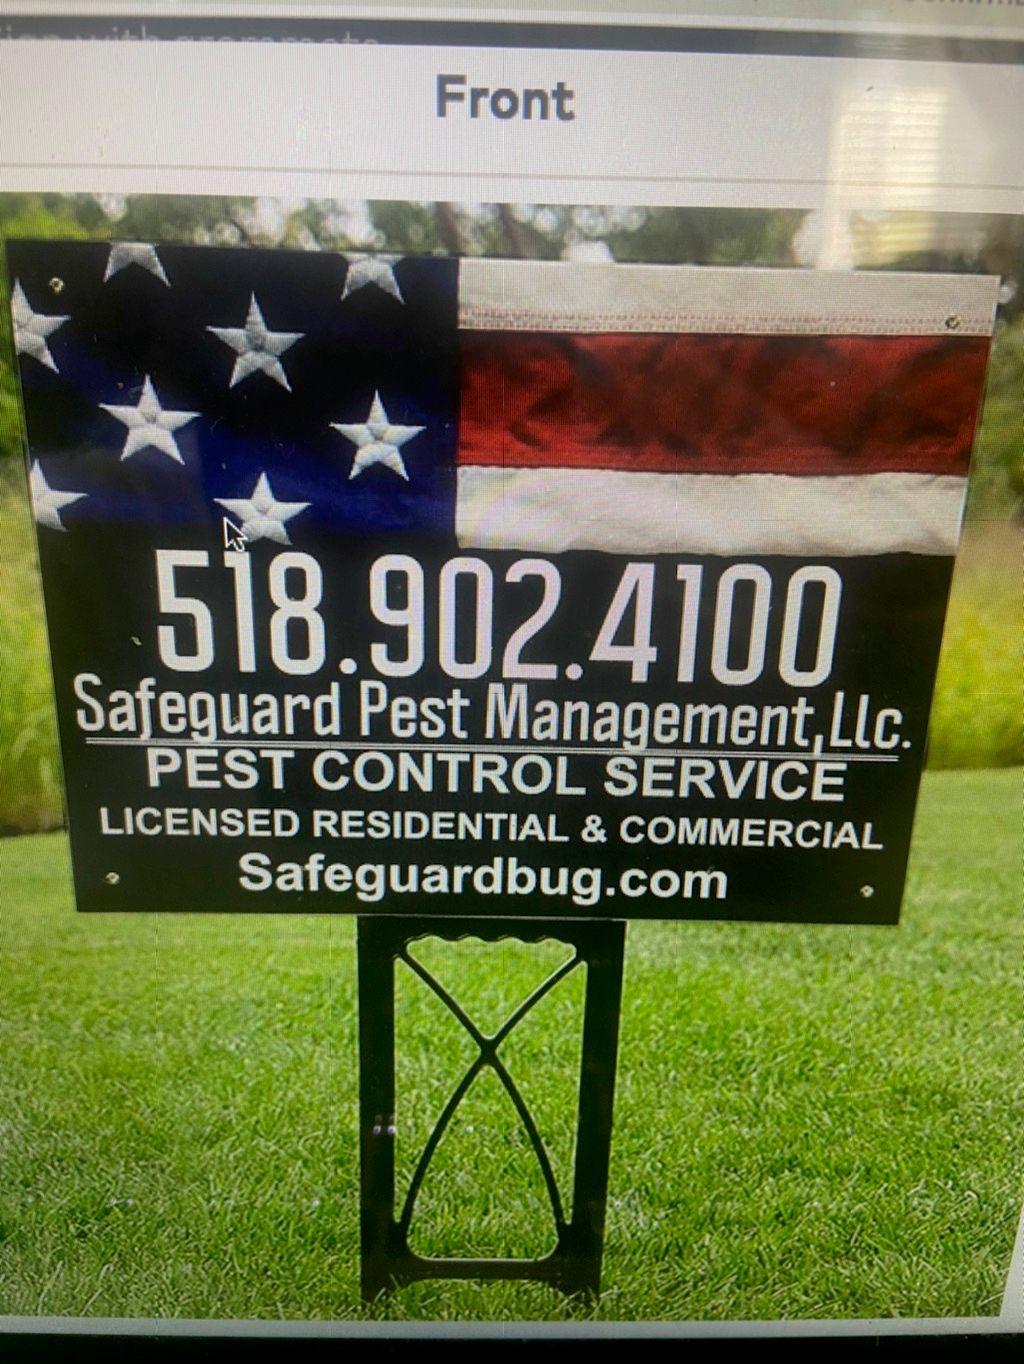 Safeguard Pest Management,LLC .